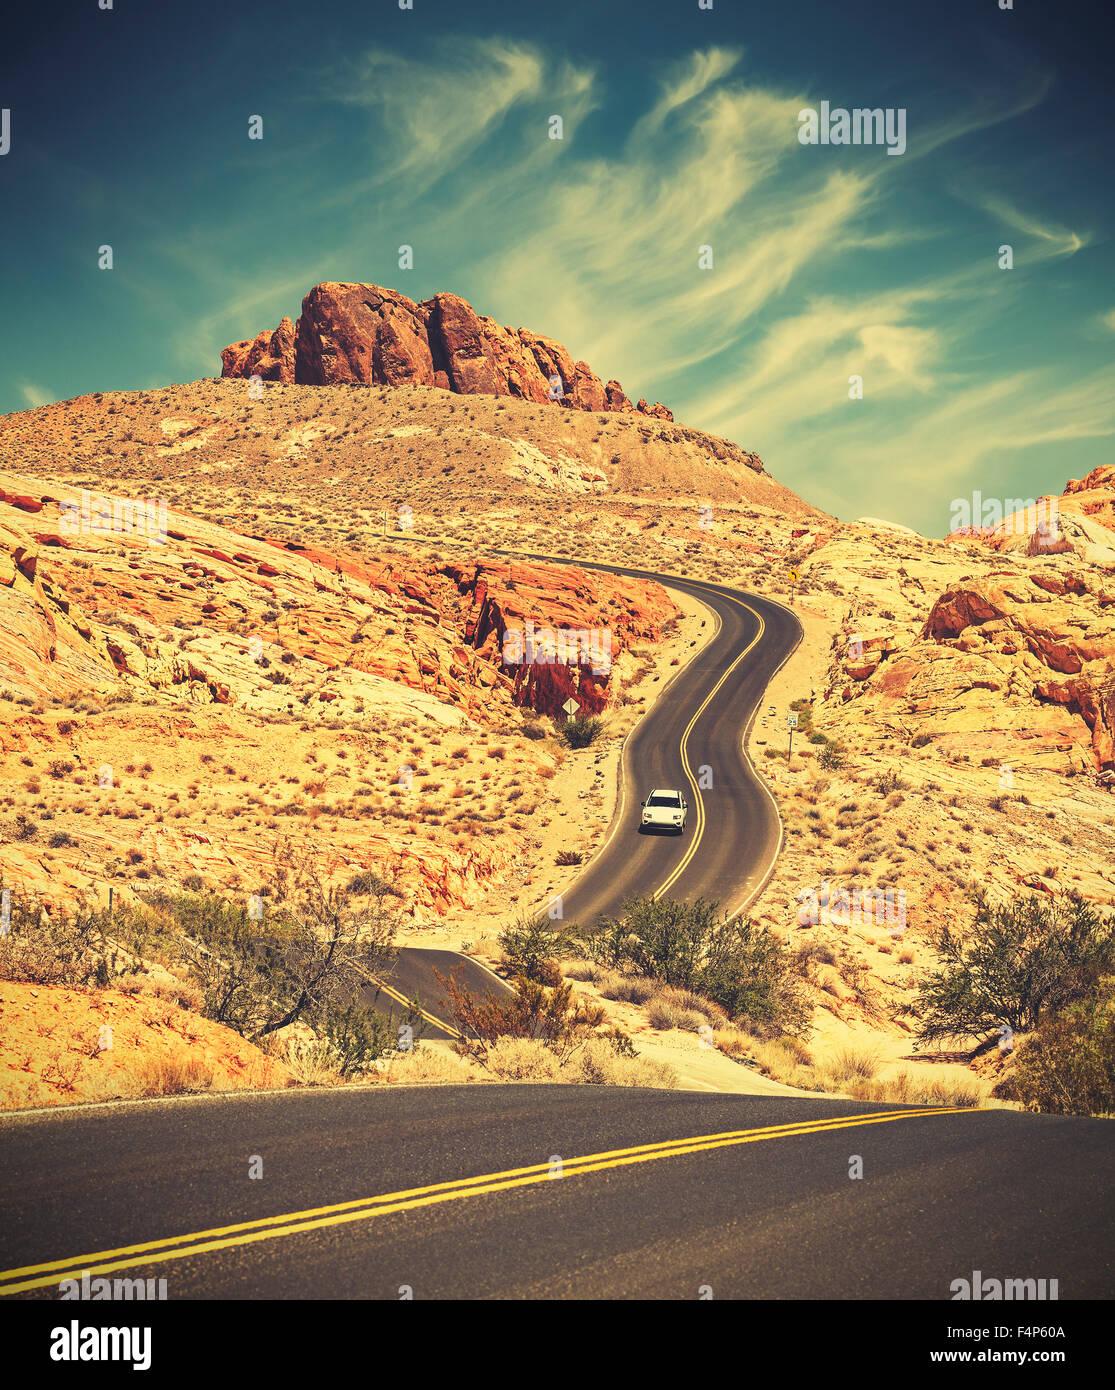 Retro getönten Wicklung Desert Highway, Abenteuer Reisekonzept, Valley of Fire State Park, Nevada, USA. Stockbild